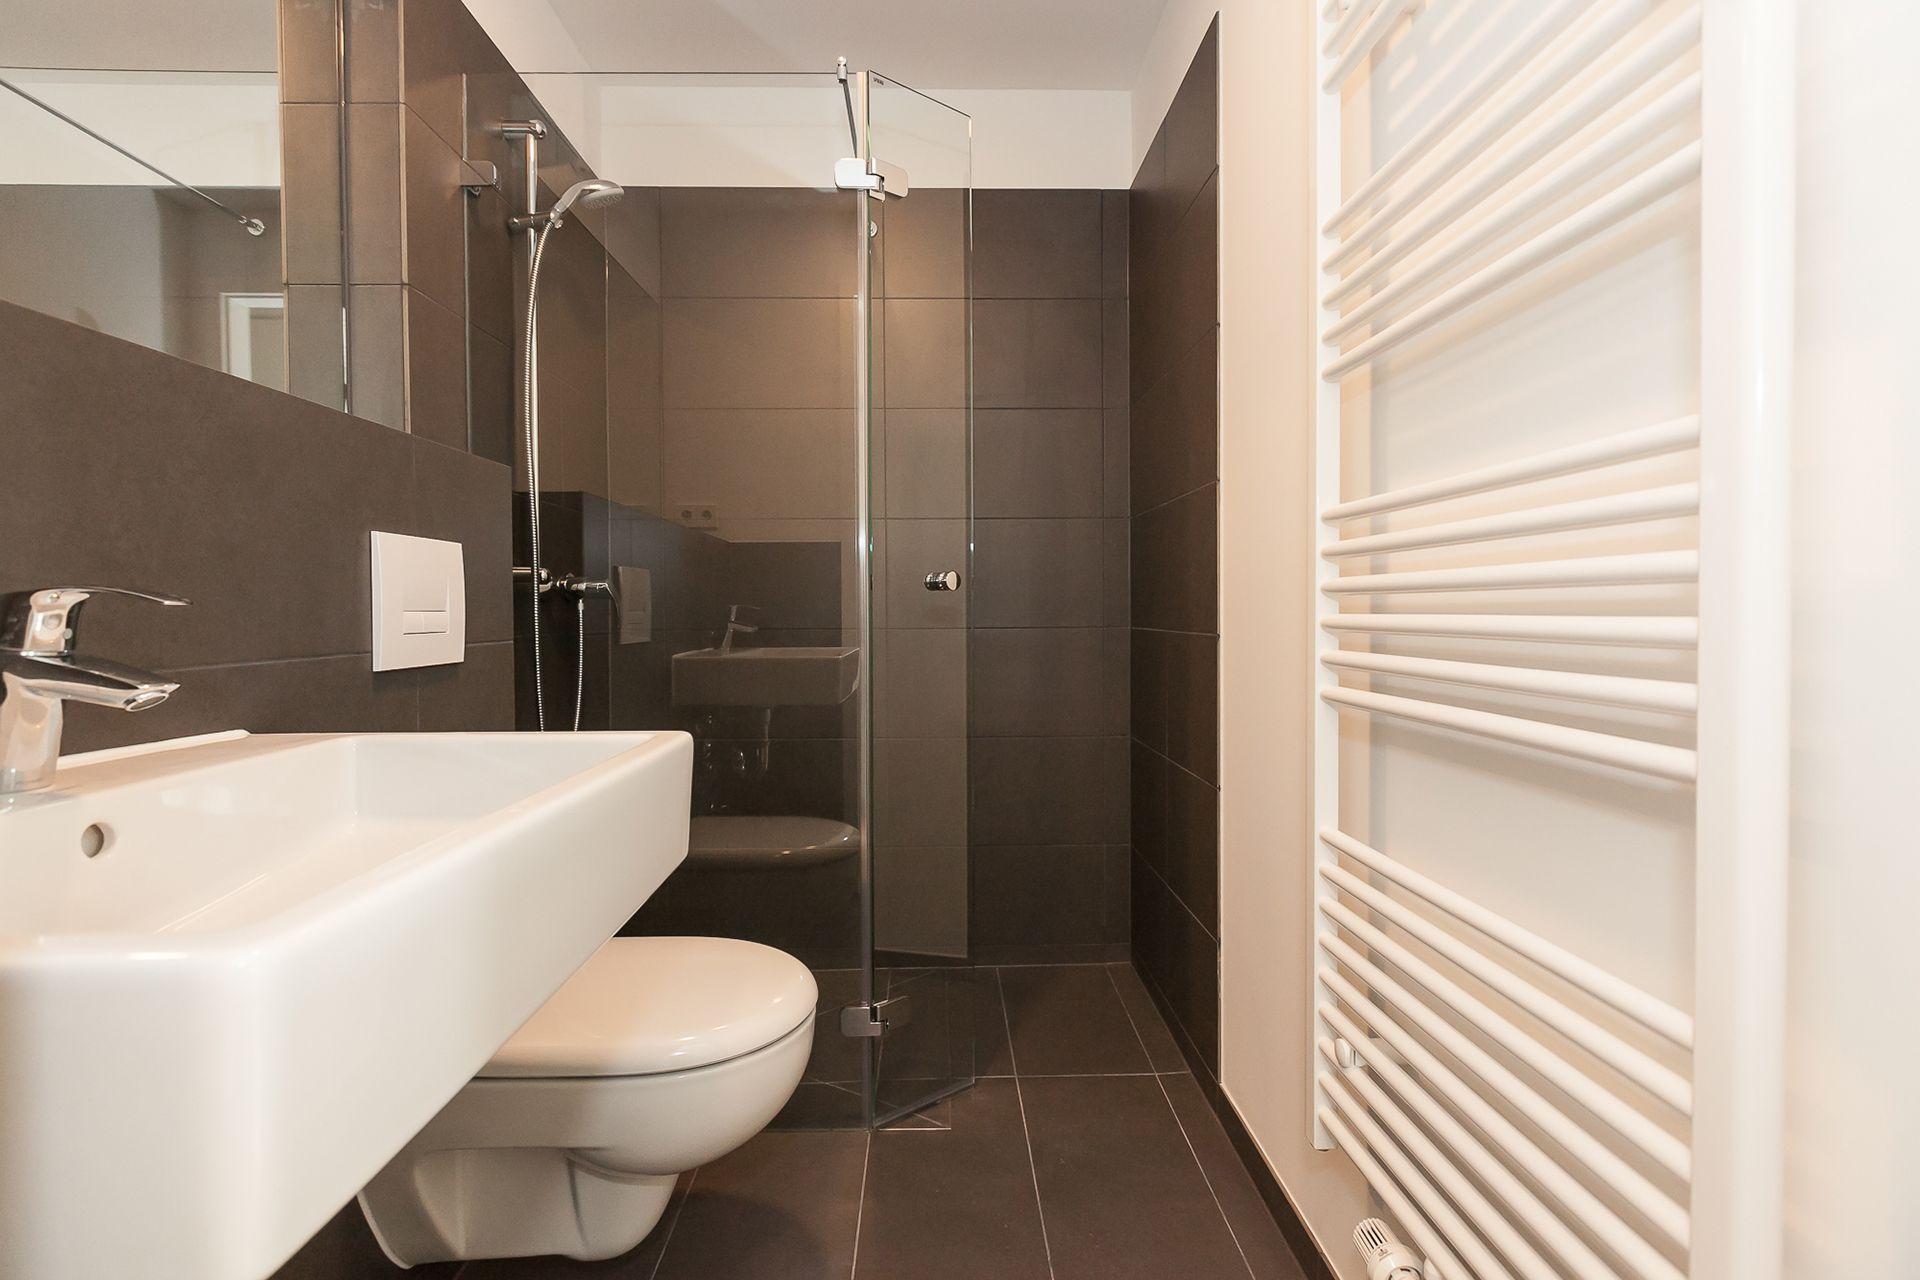 1 Bedroom - Small apartment to rent in Berlin KOEP-KOEP-0110-0